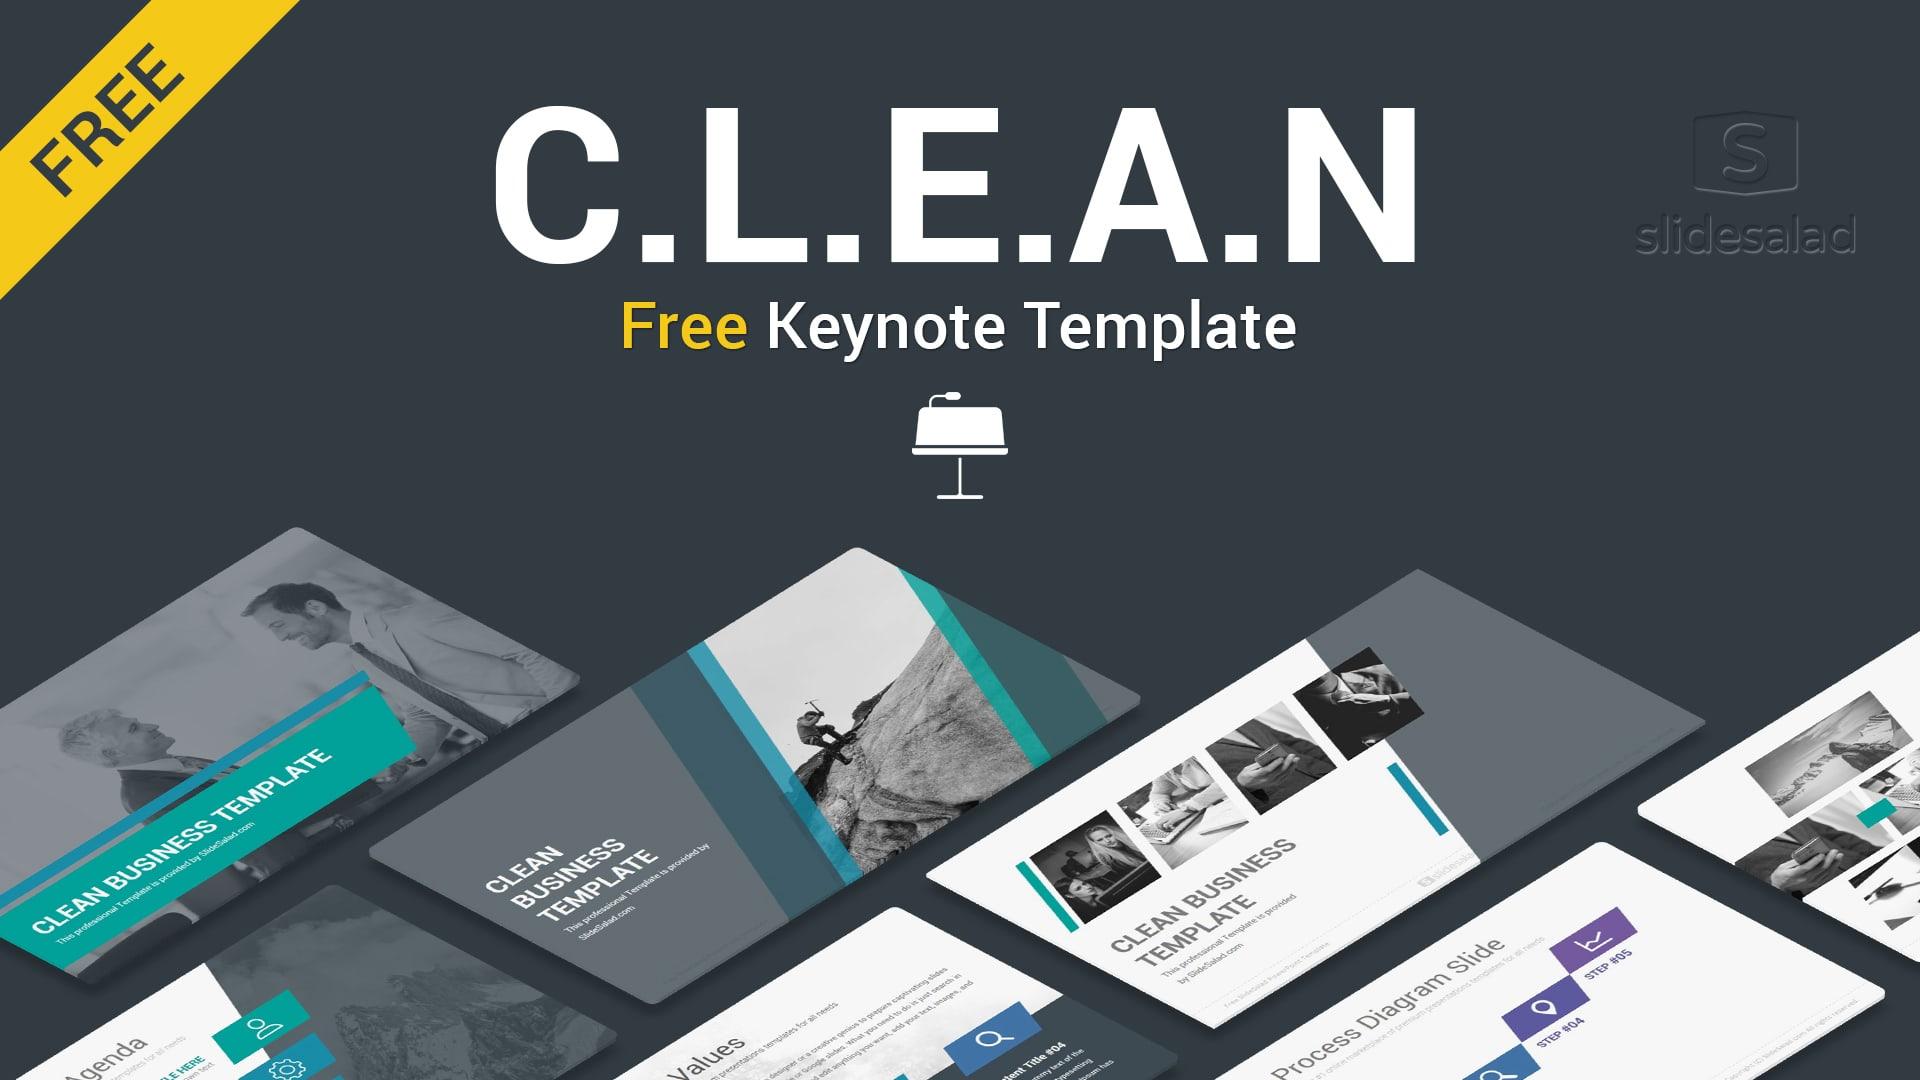 Clean Free Keynote Template - Free Download